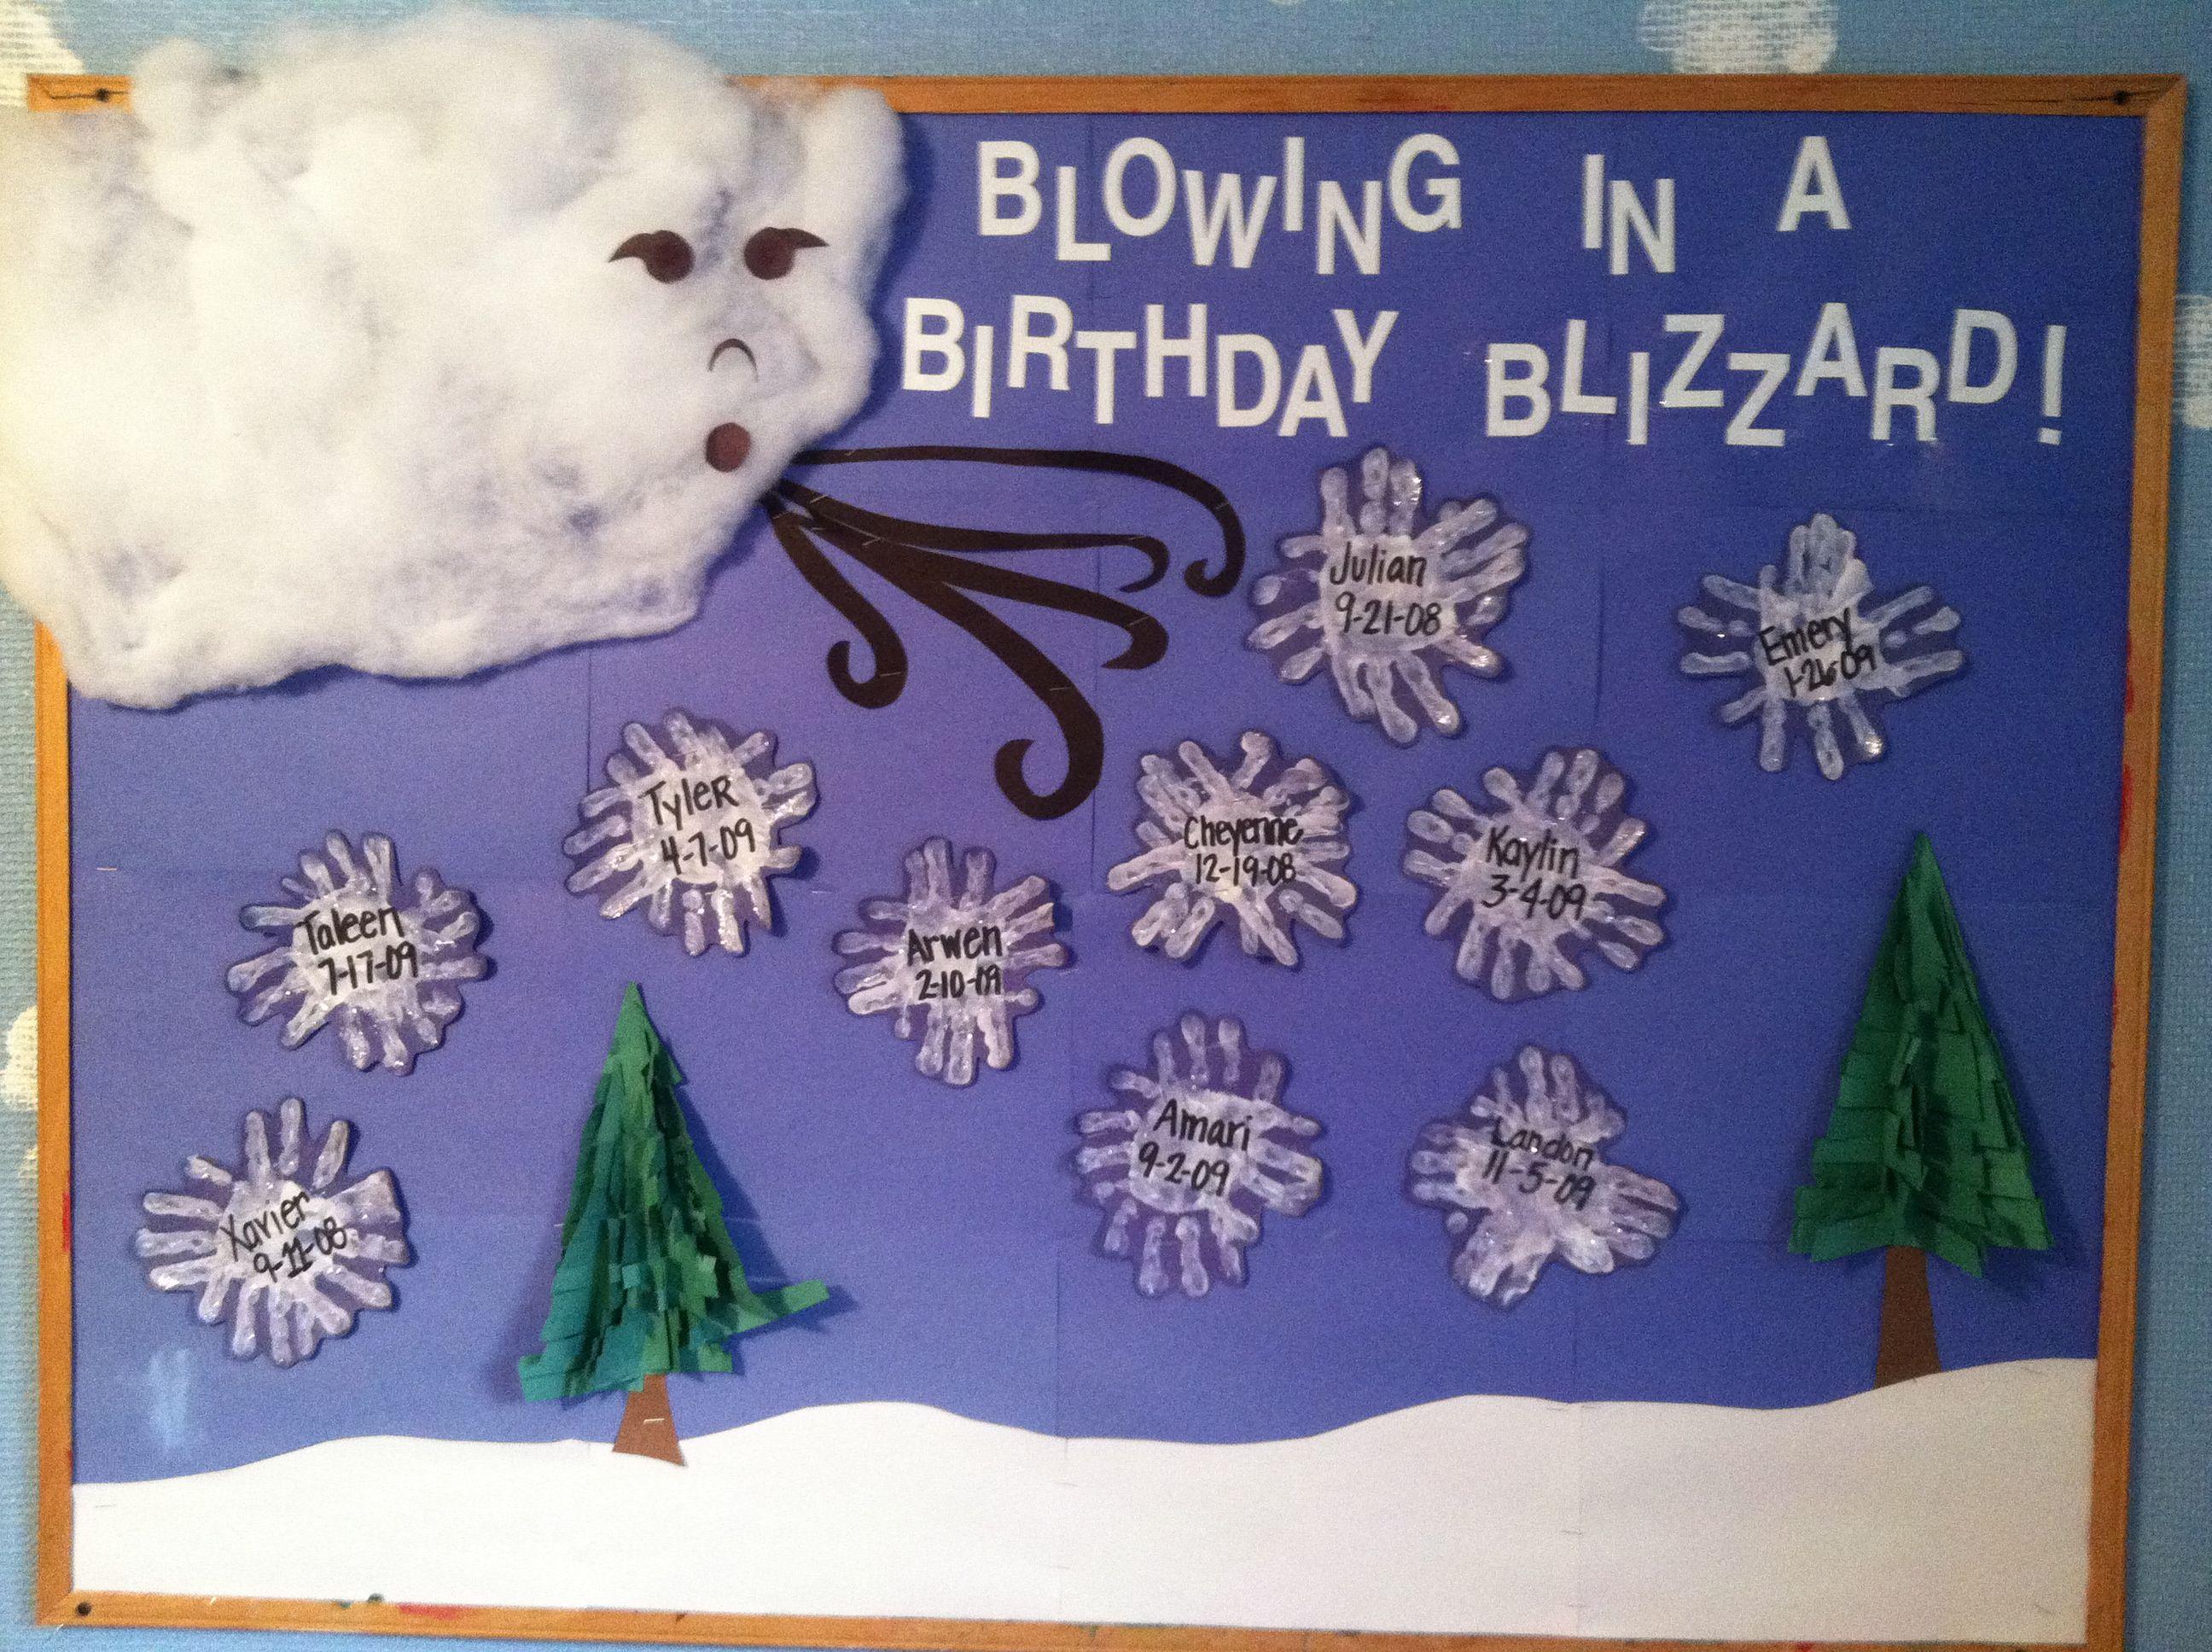 Winter bulletin boards ideas pinterest - Handprint Blizzard Winter Bulletin Board I Used Sewing Batting For The Cloud To Make It